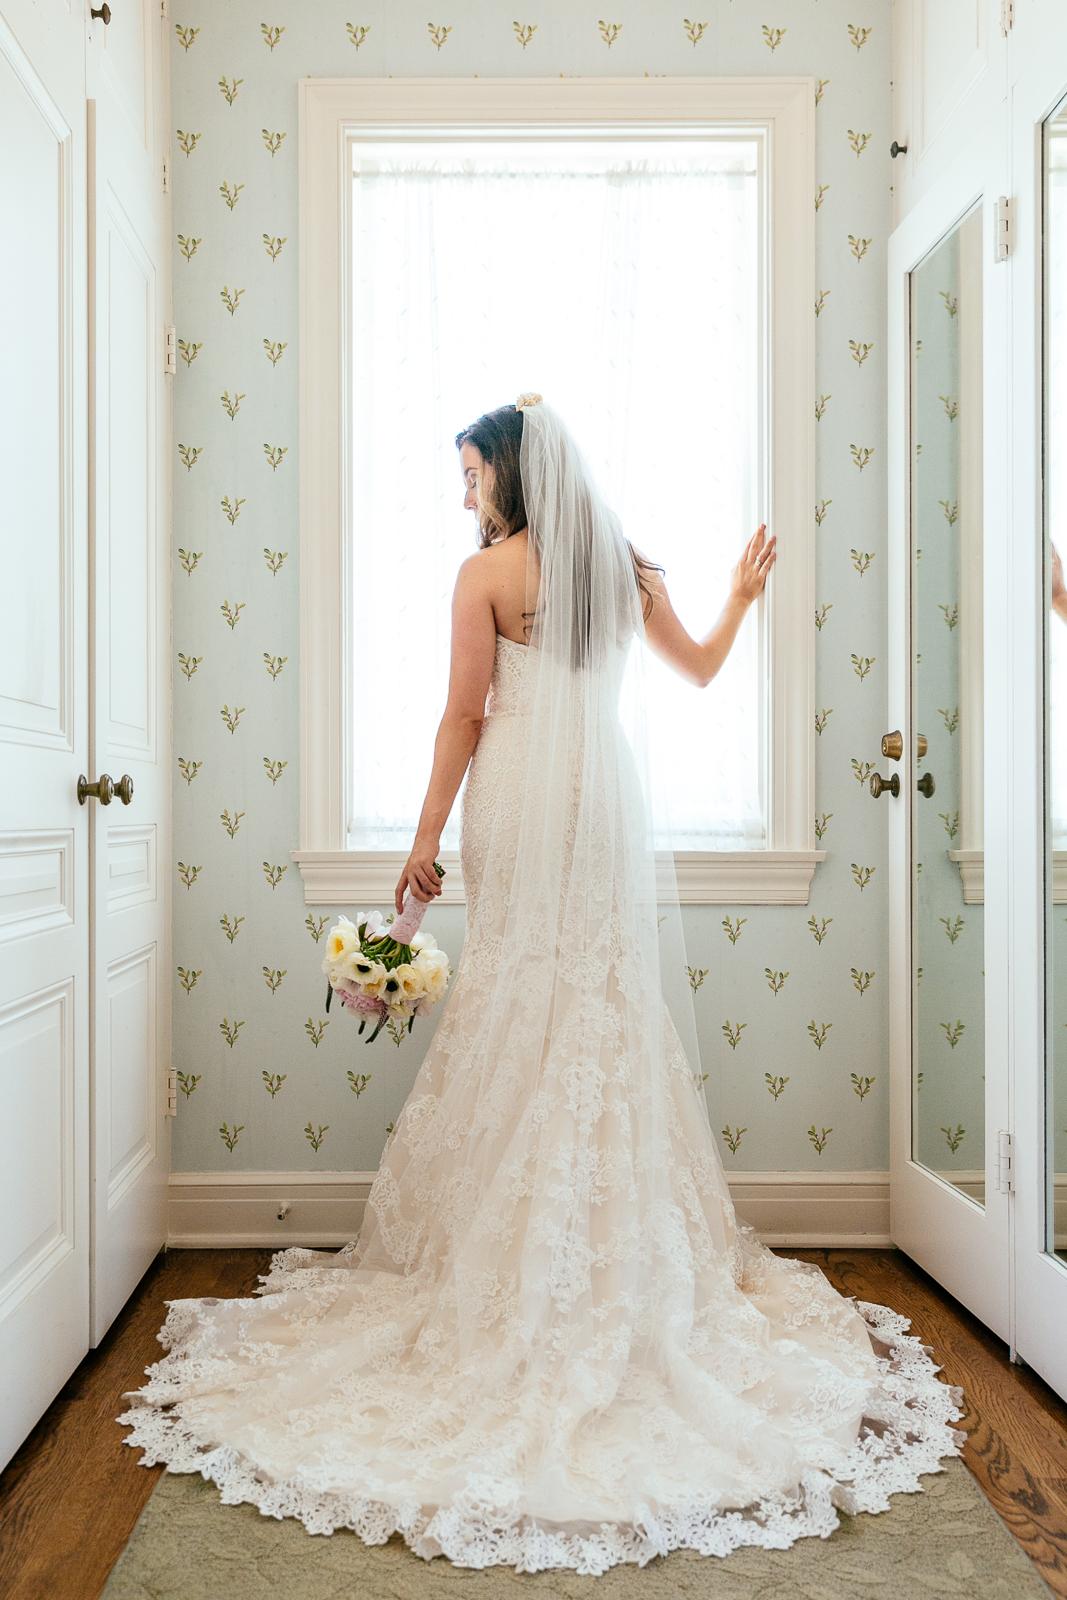 Amanda_&_Steve_Wedding_Darlington_House_La_Jolla_2015_IMG_6047.JPG